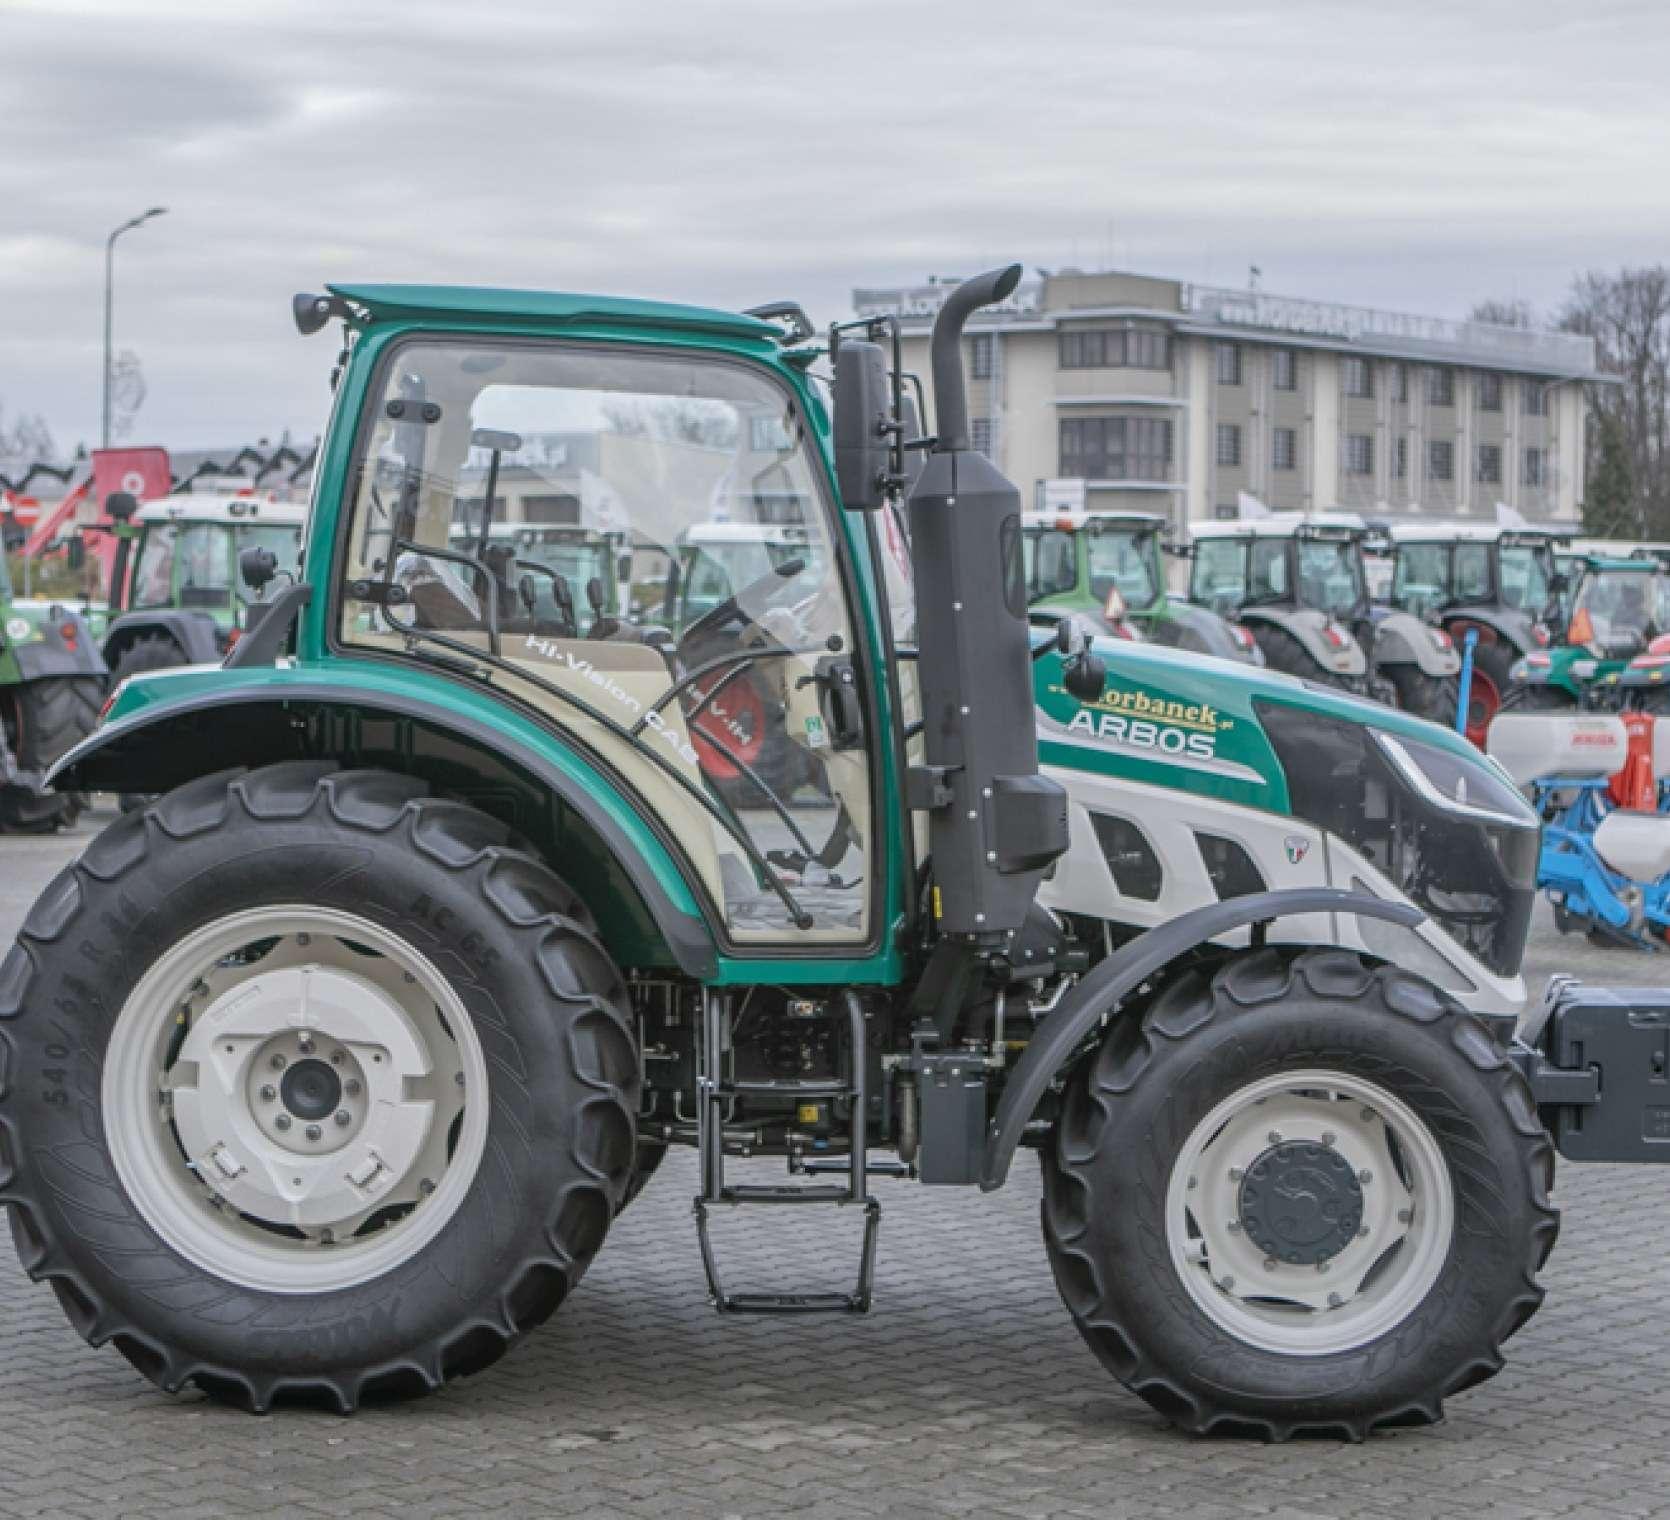 Bok ciągnika arbos 5115 advanced w tle biurowiec korbanek.pl